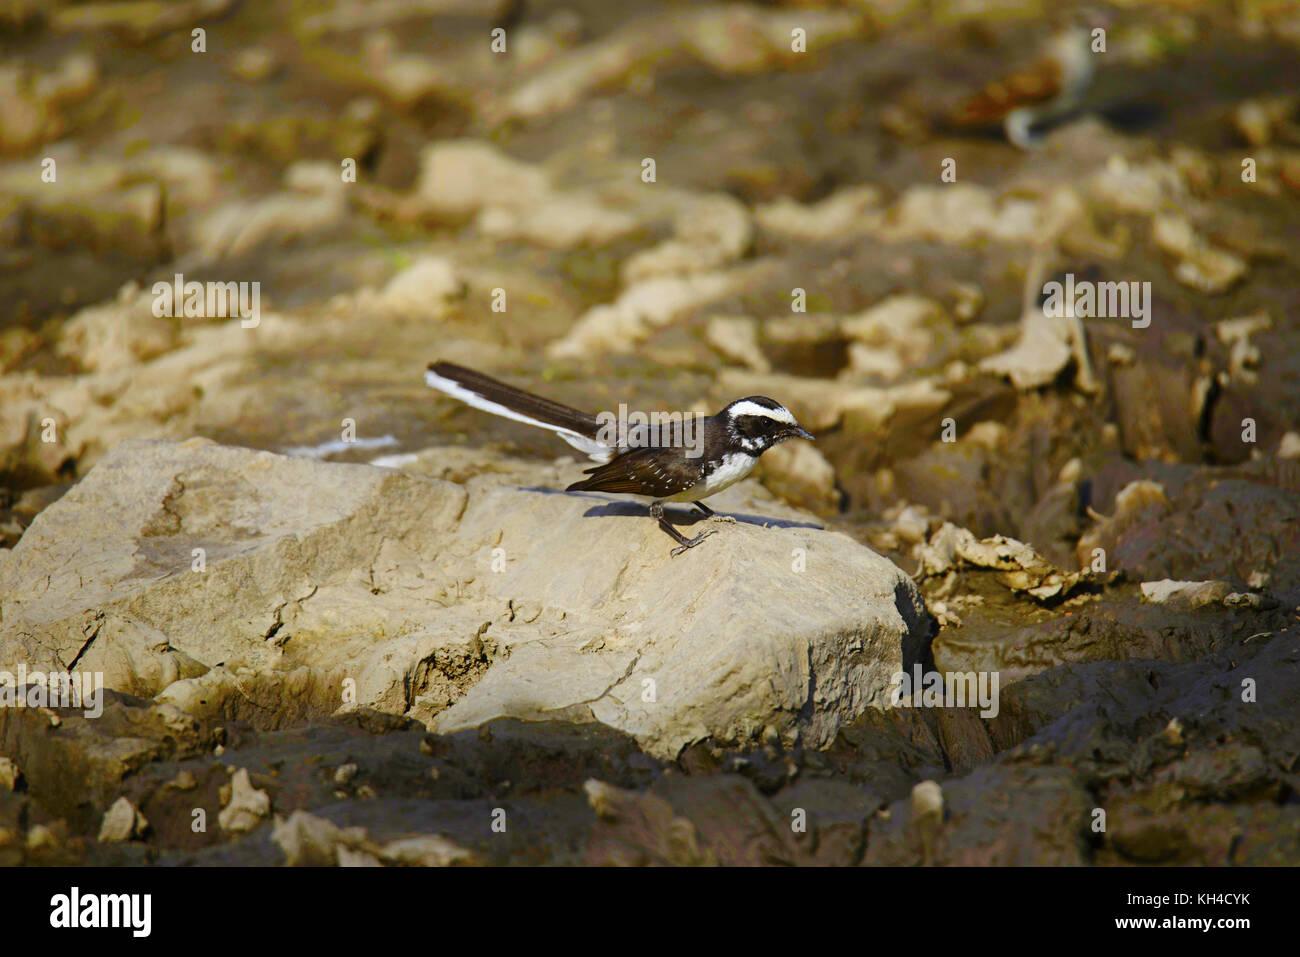 White-browed Fantail Flycatcher, Rhipidura aureola, Panna Tiger Reserve, Madhya Pradesh - Stock Image